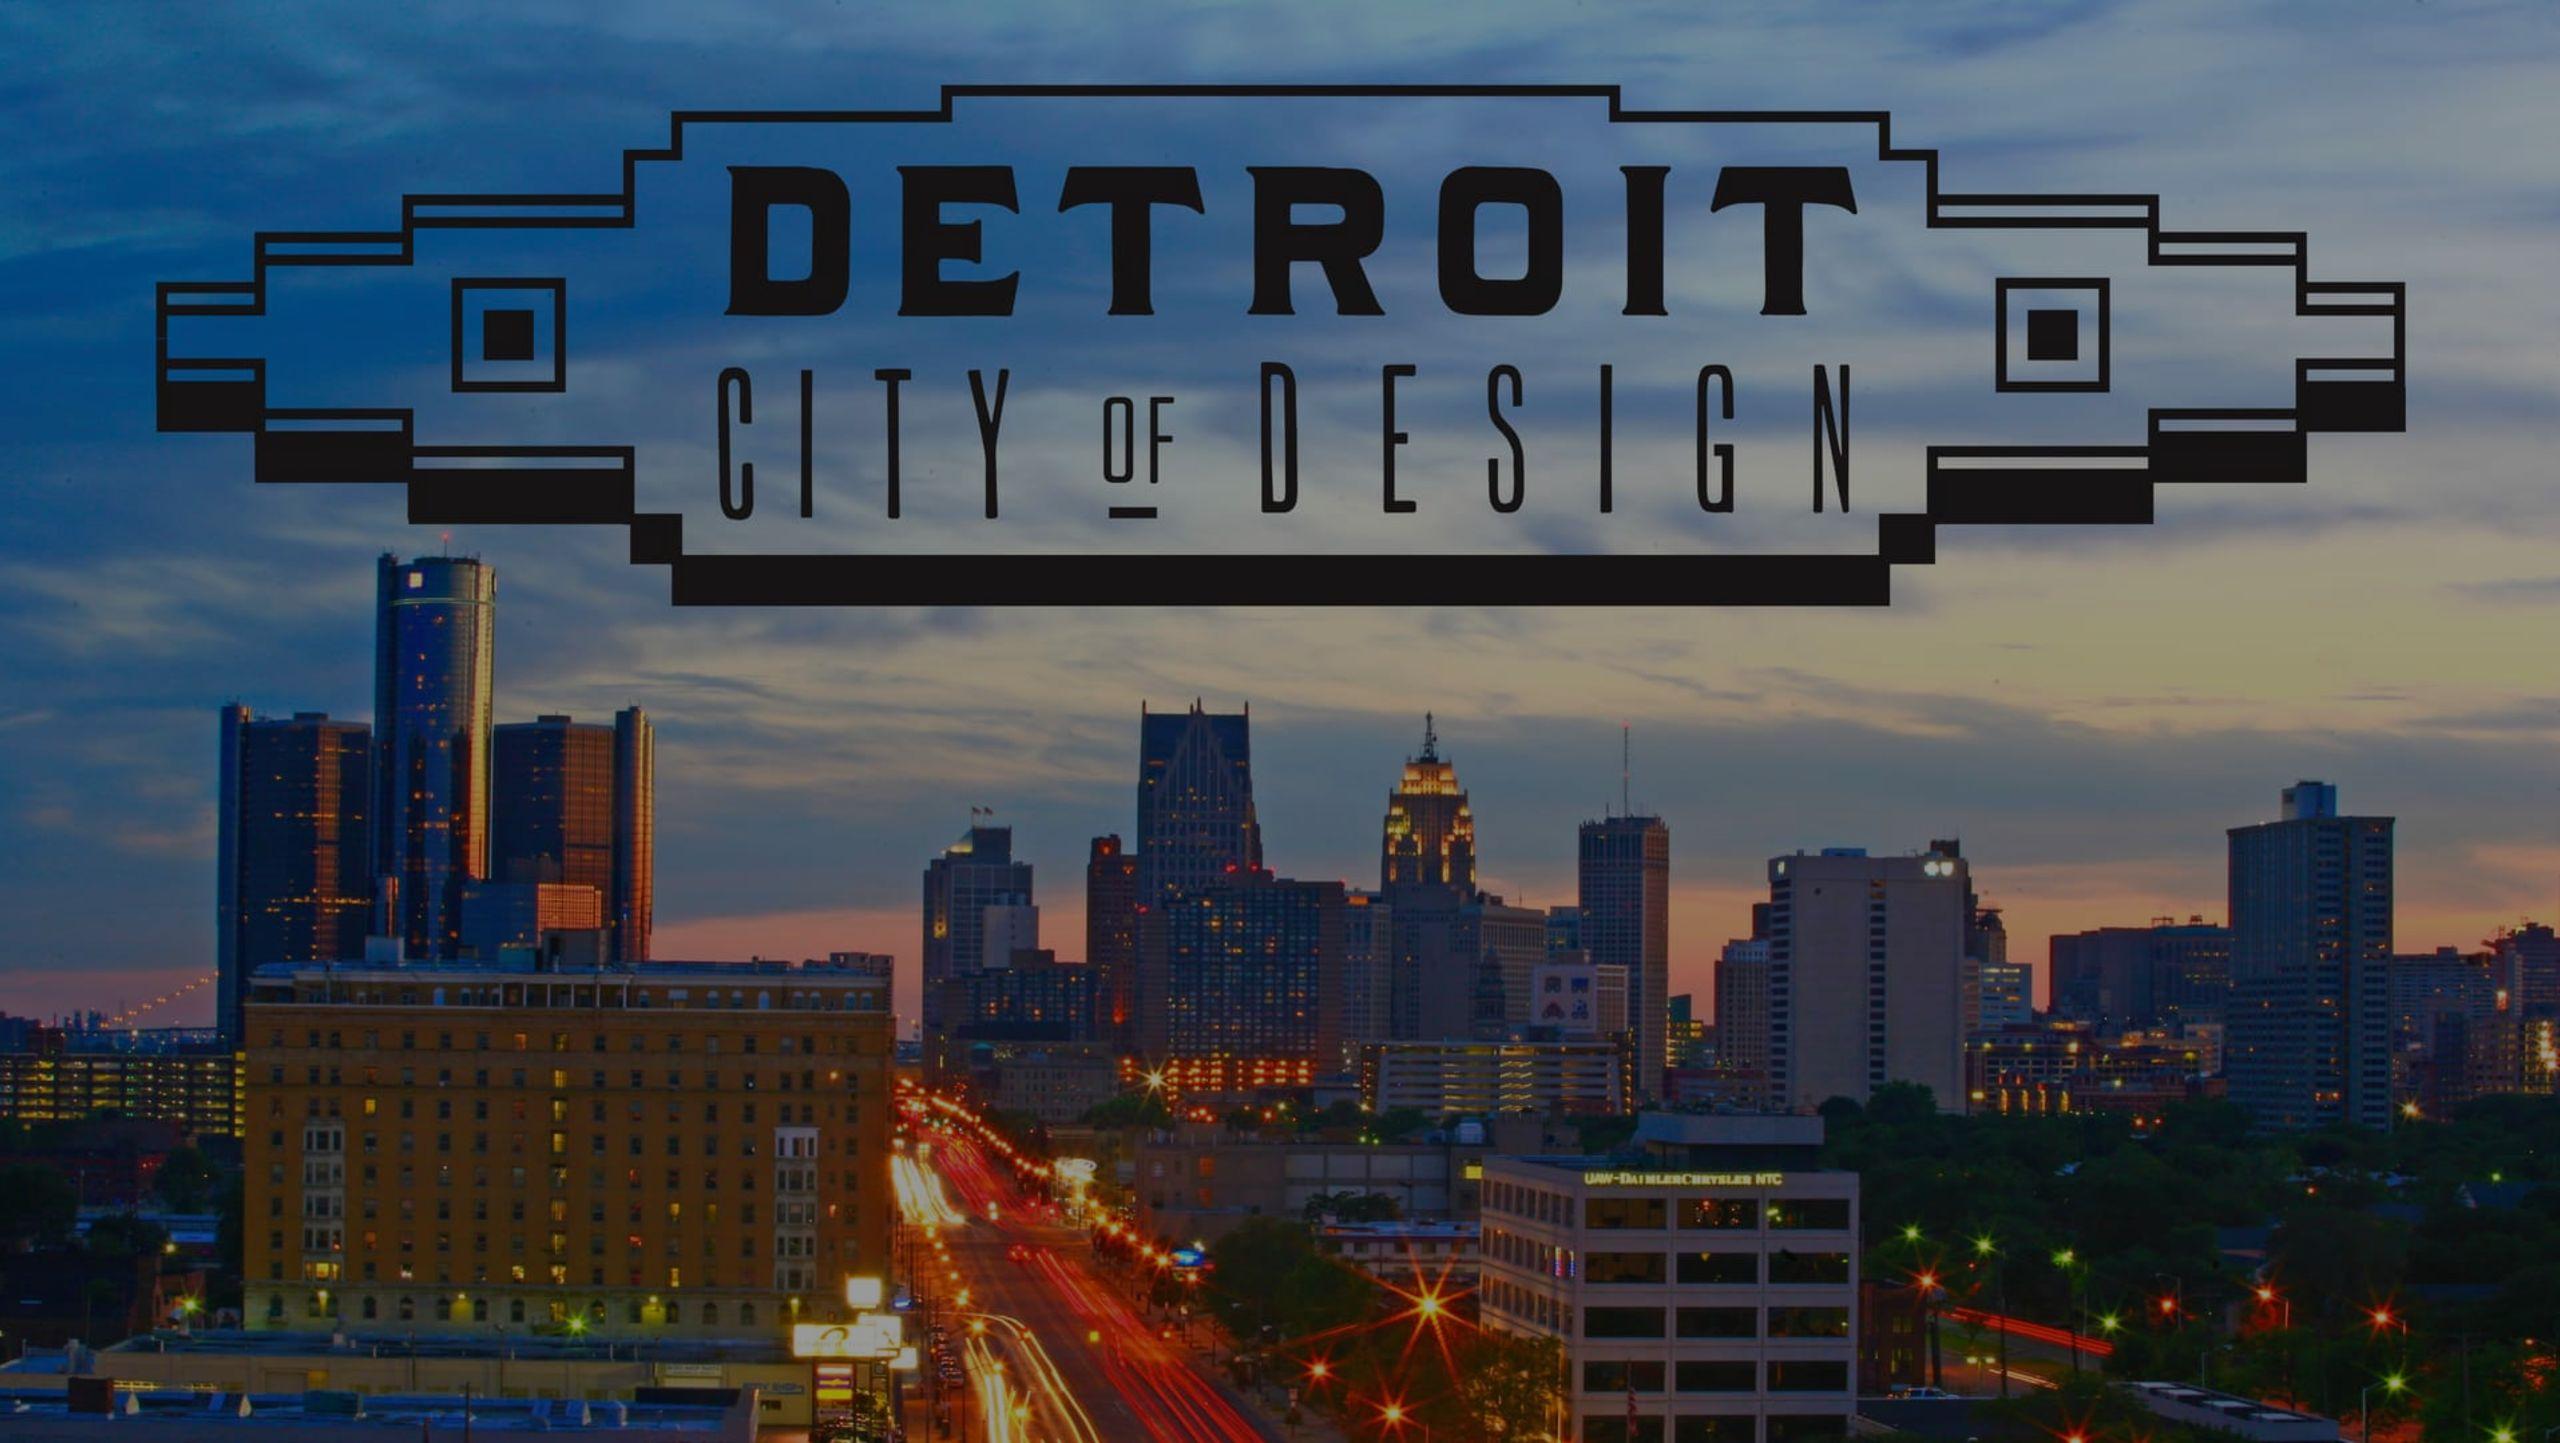 Detroit City of Design